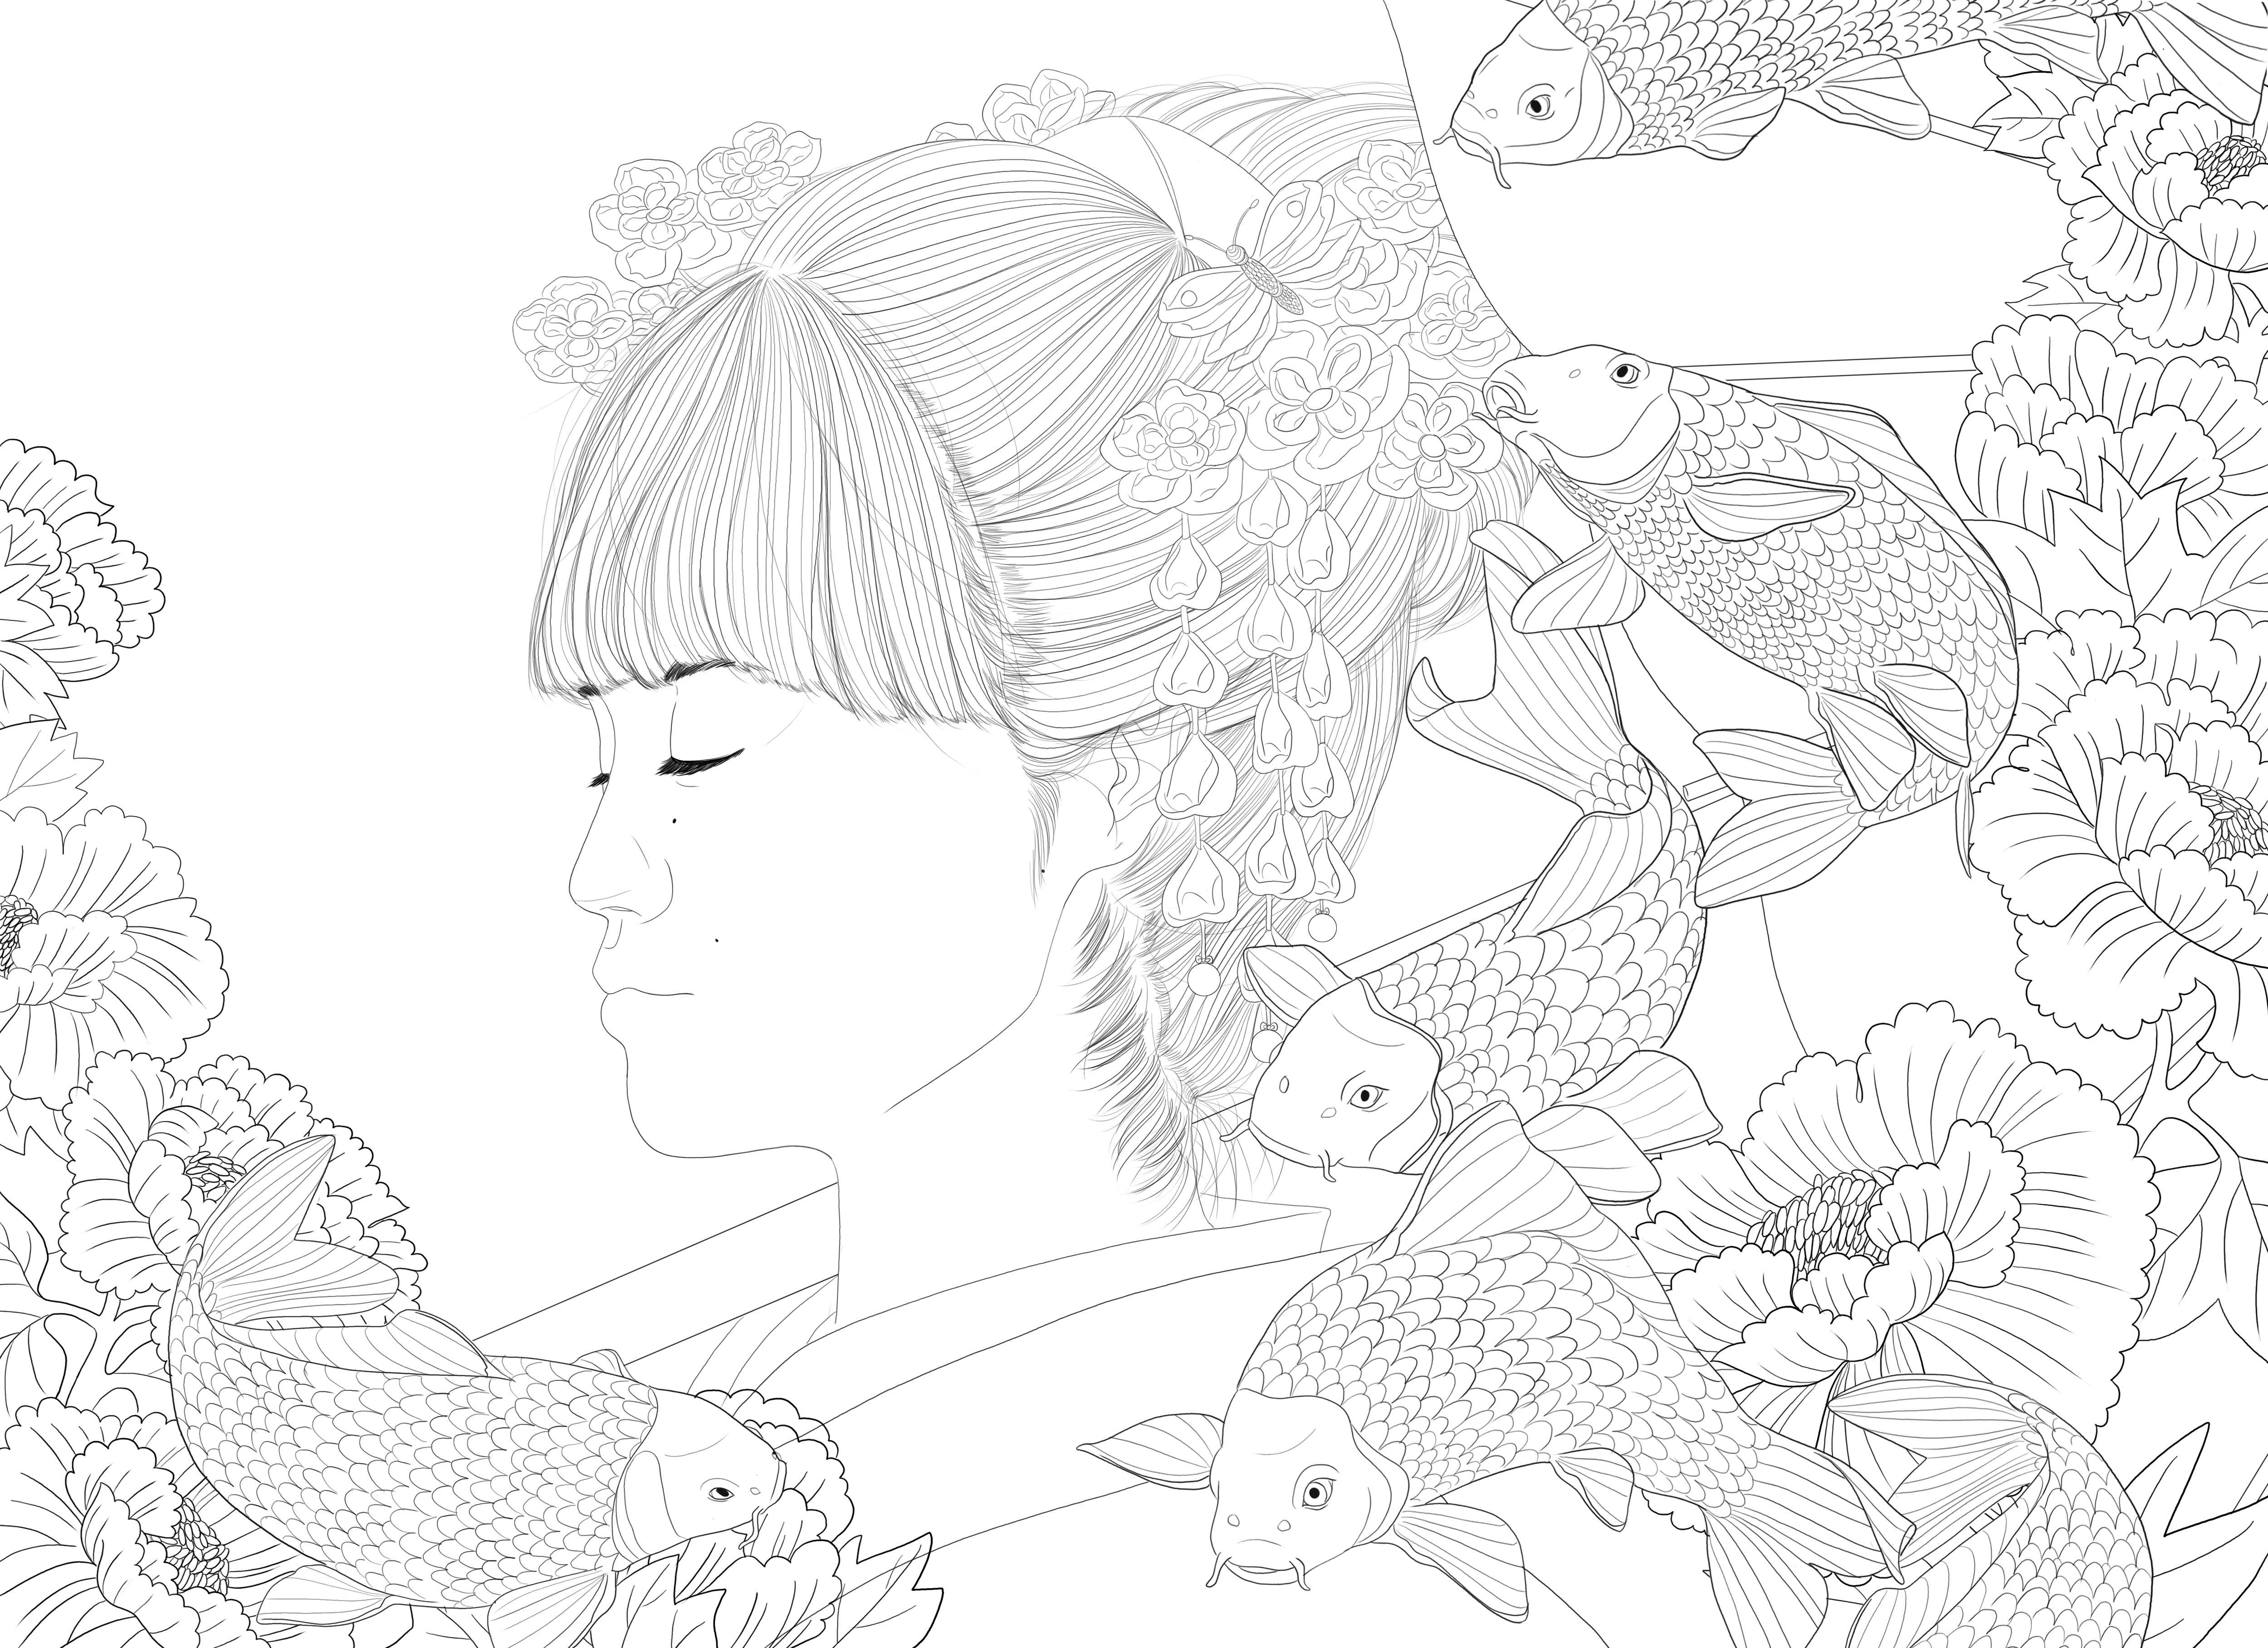 yukina_japanese_style_by_rijio-d4ykq0i.jpg 5,000×3,633 pixels